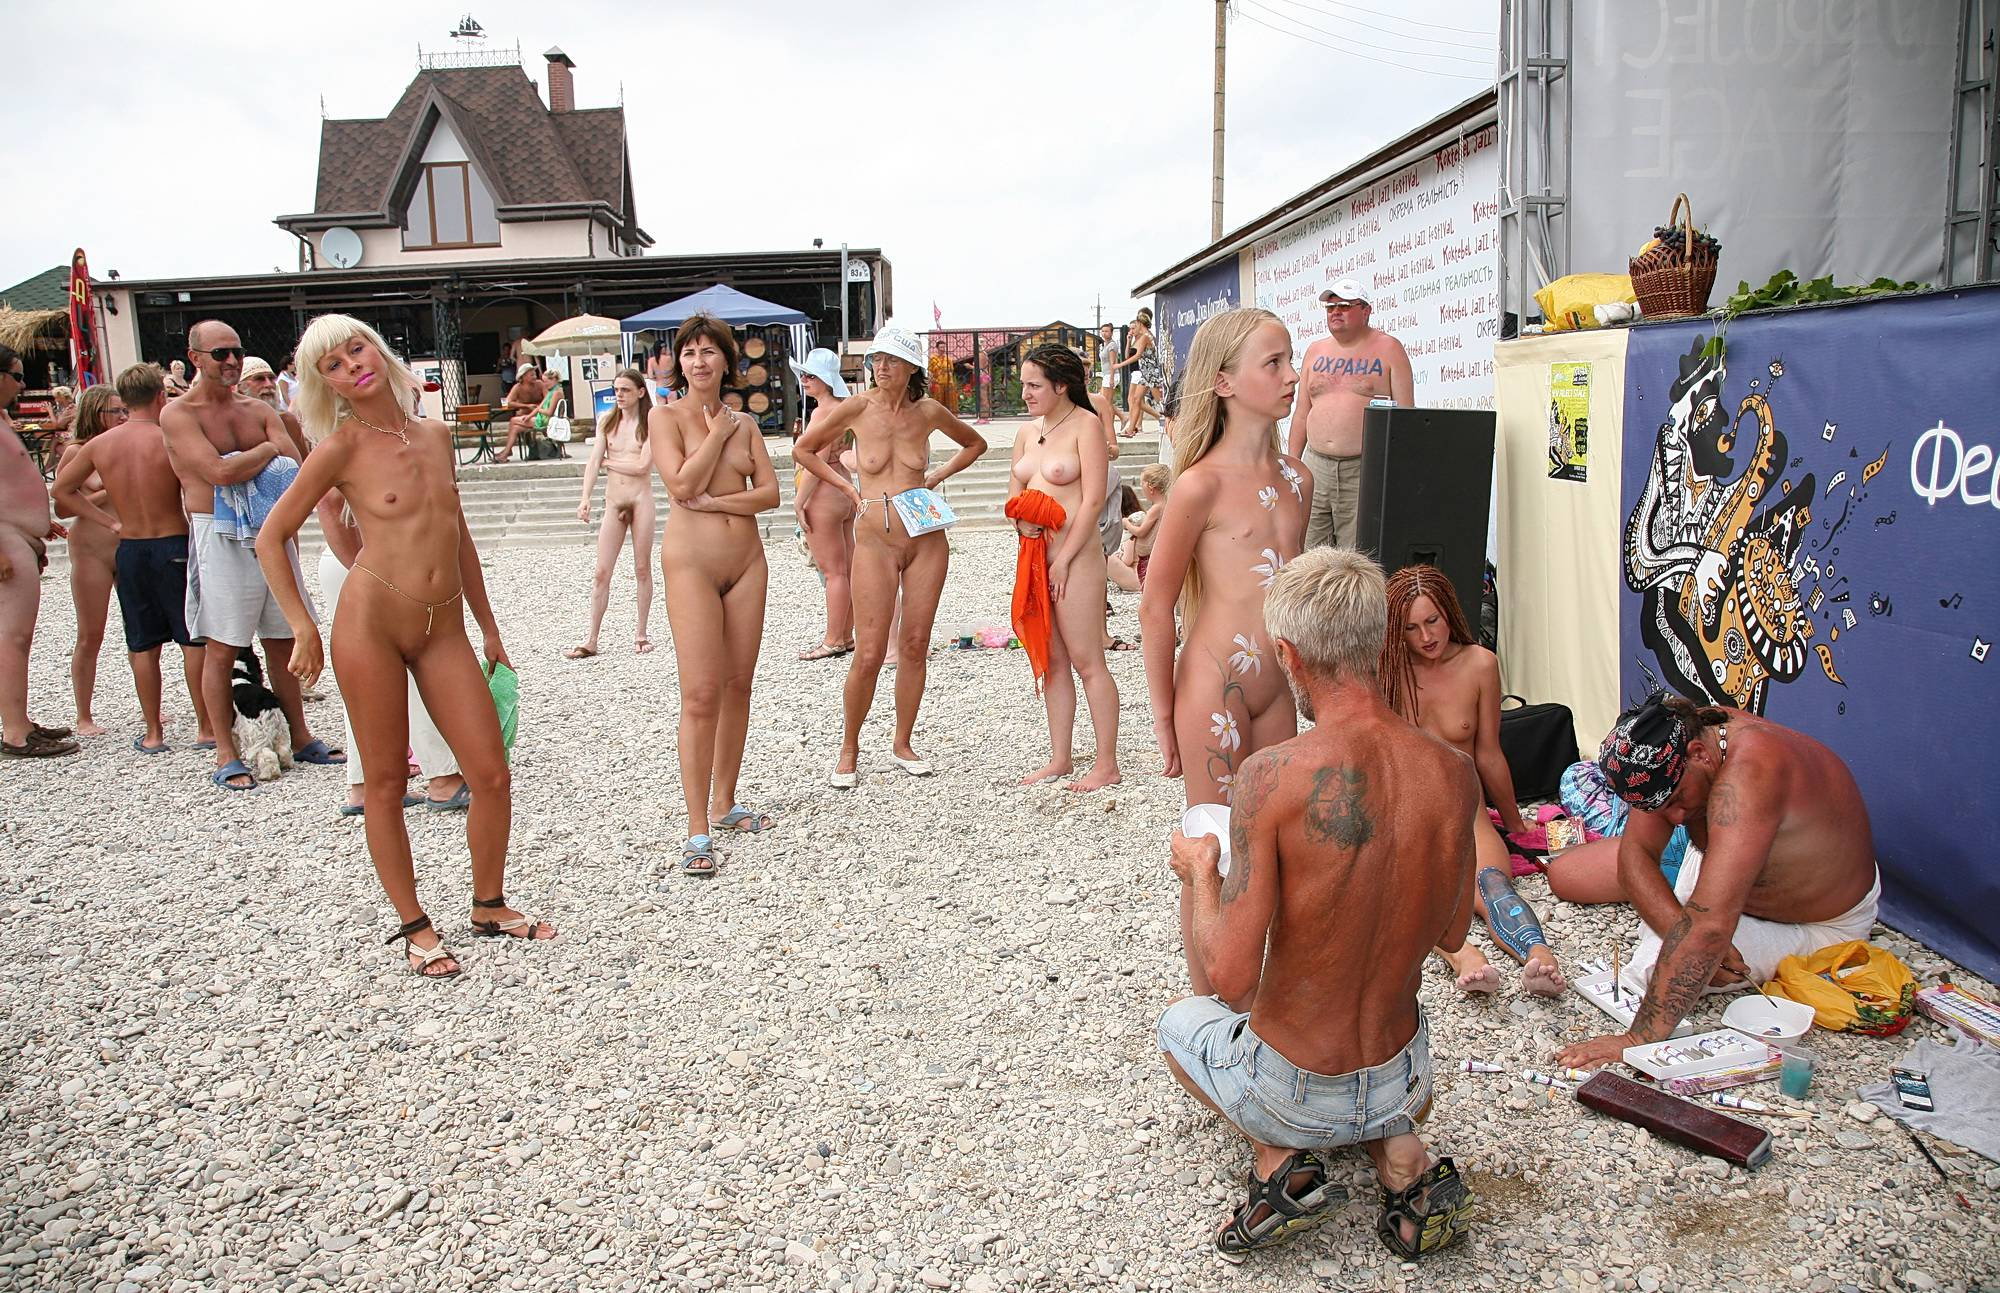 Purenudism Photos-Outdoor Art Celebration - 1